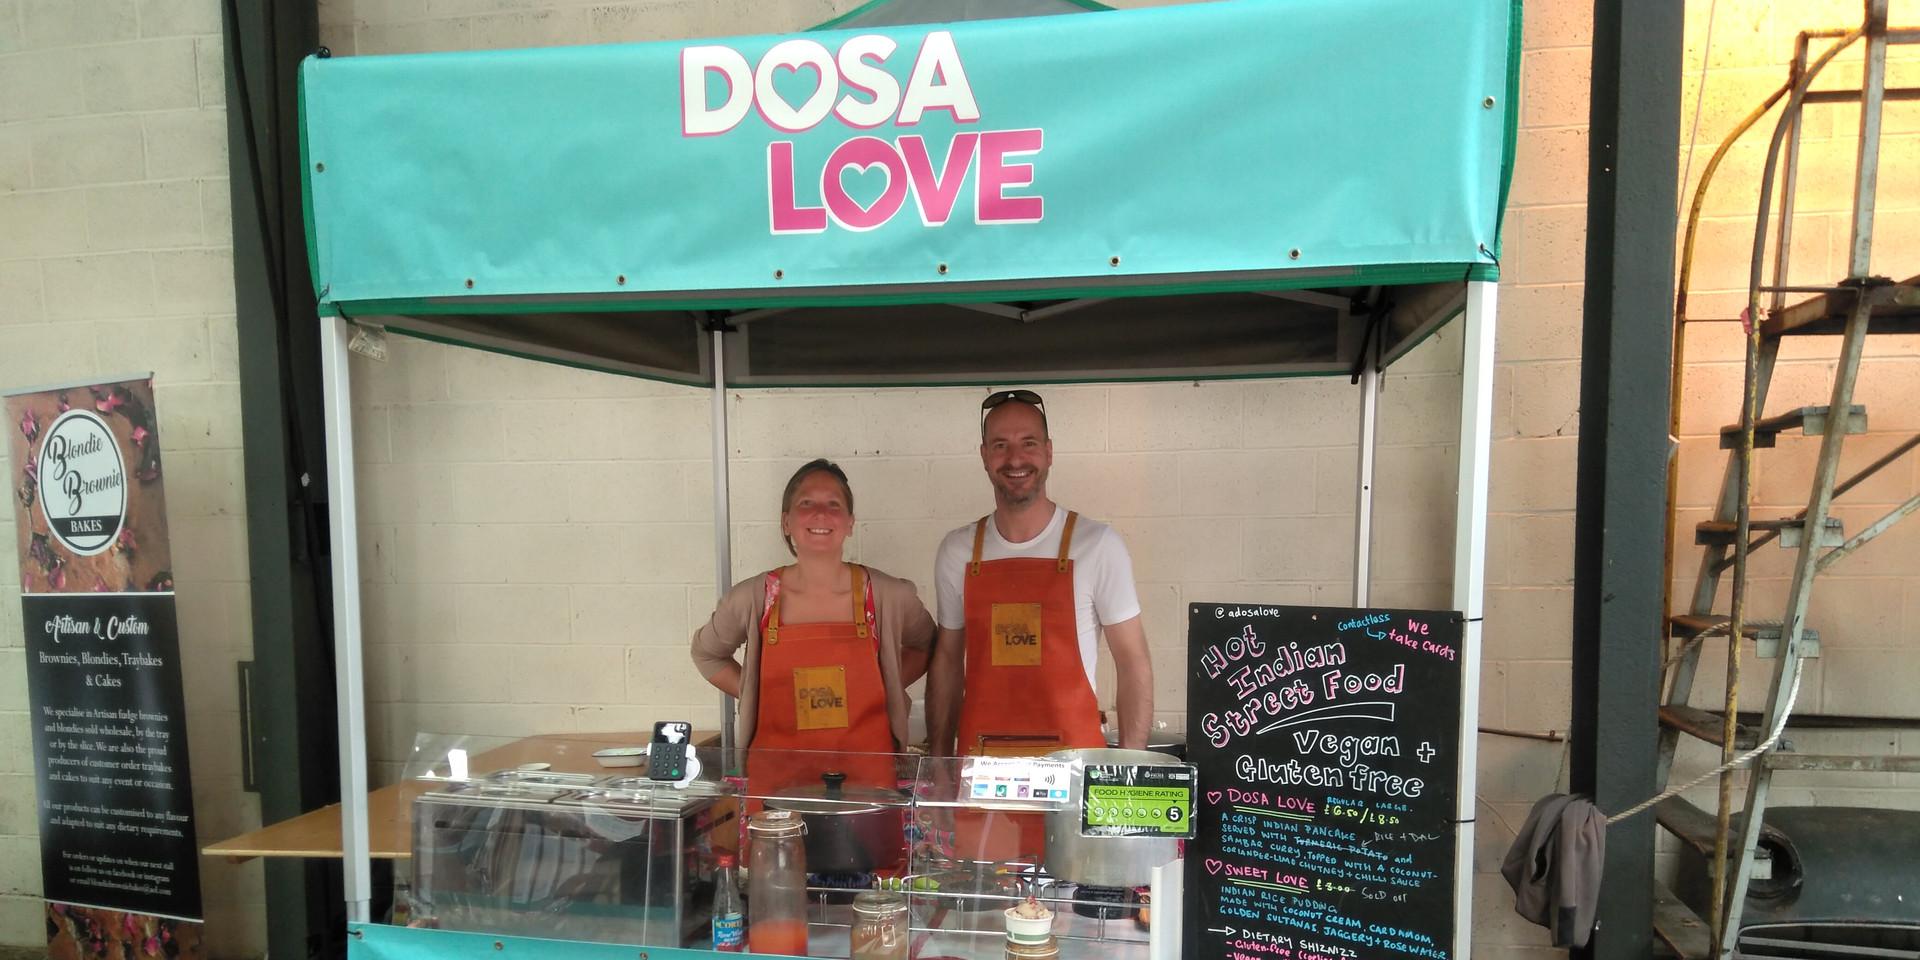 Dosa Love at The Bus Depot